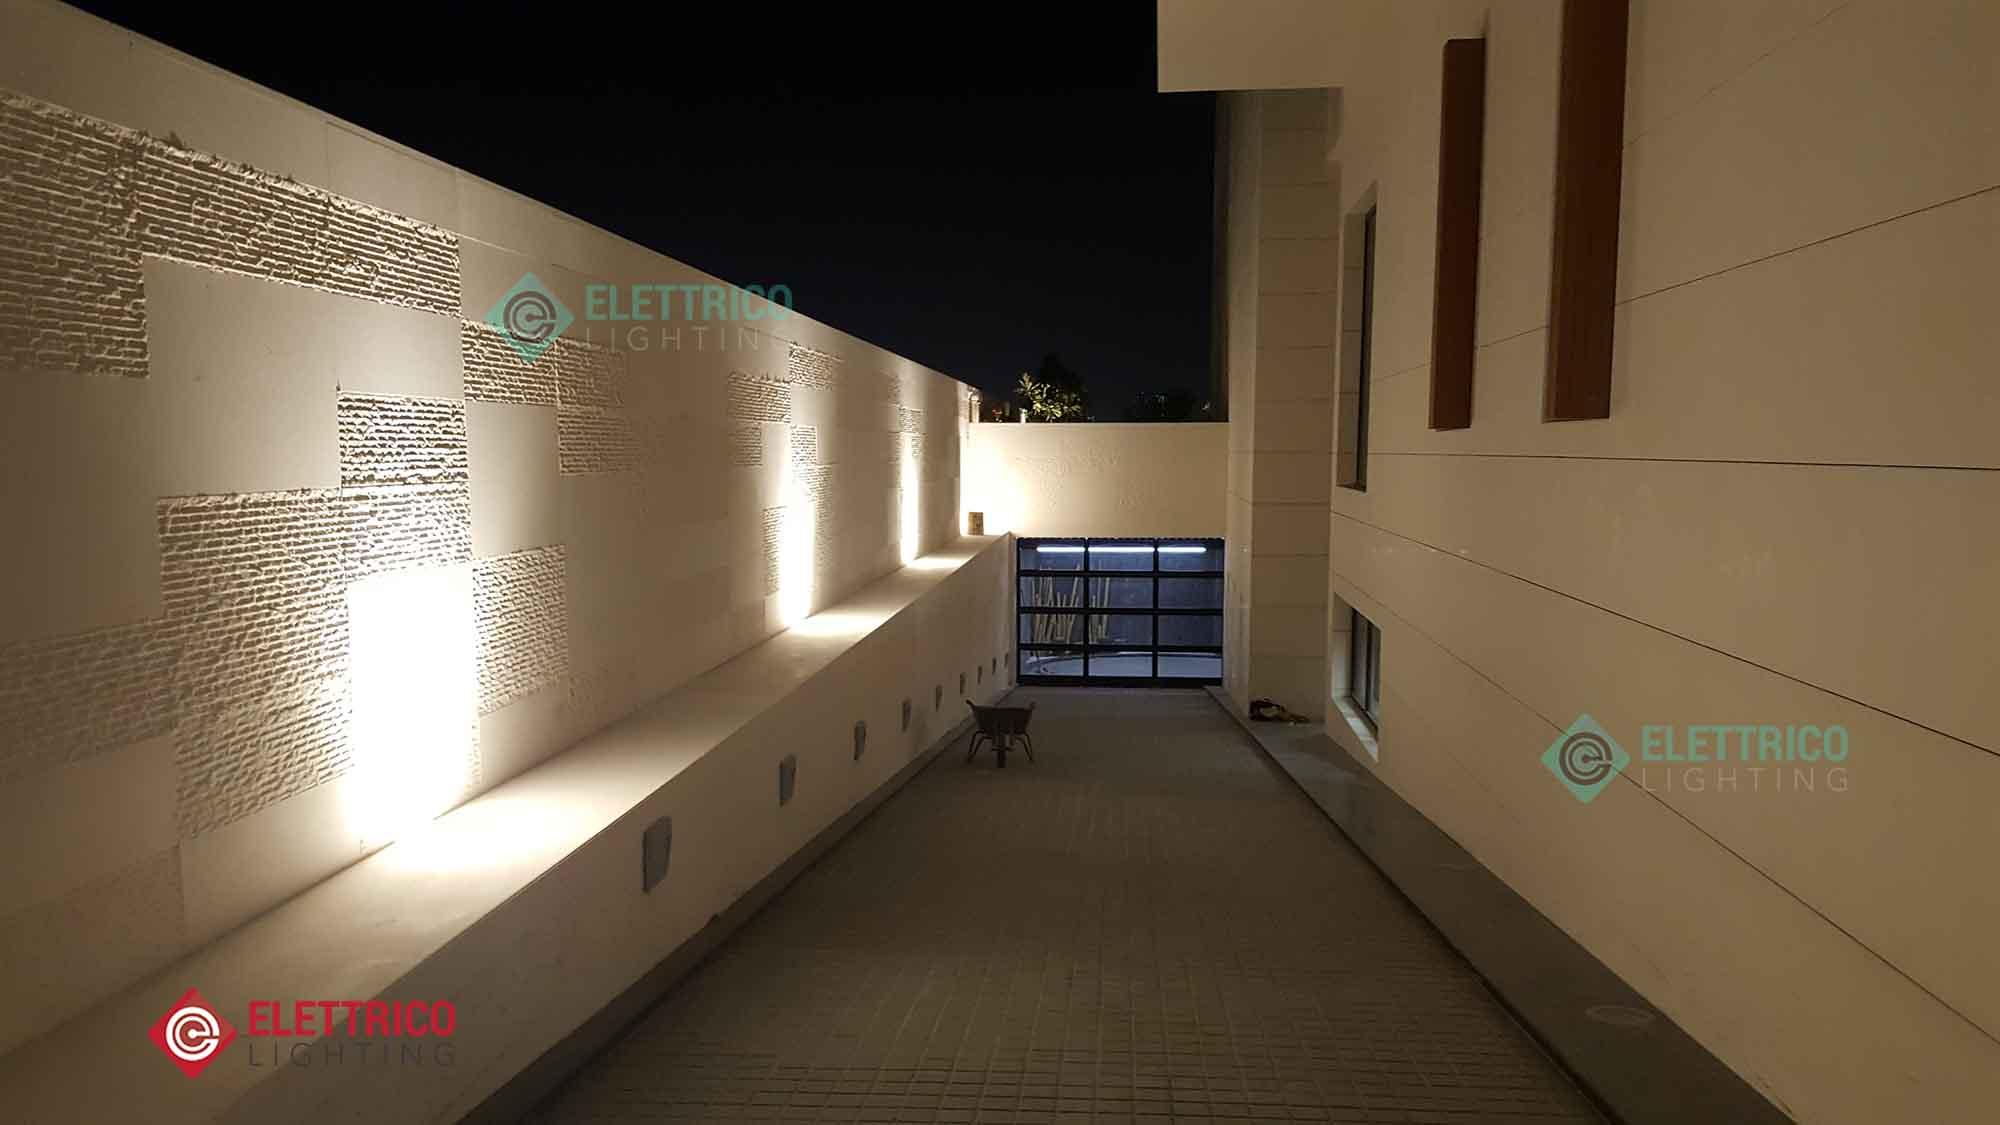 Exterior Lighting For Villas Elettrico In Dubai